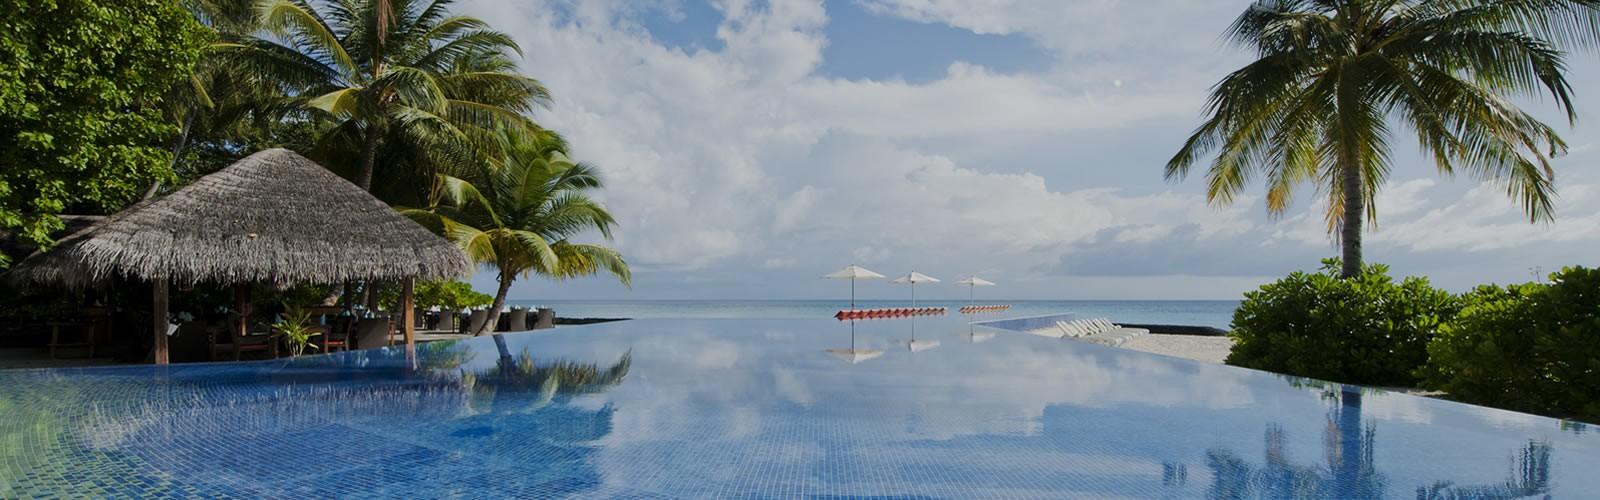 honeymoon-dreams-header-pure-destinations-partner.jpg